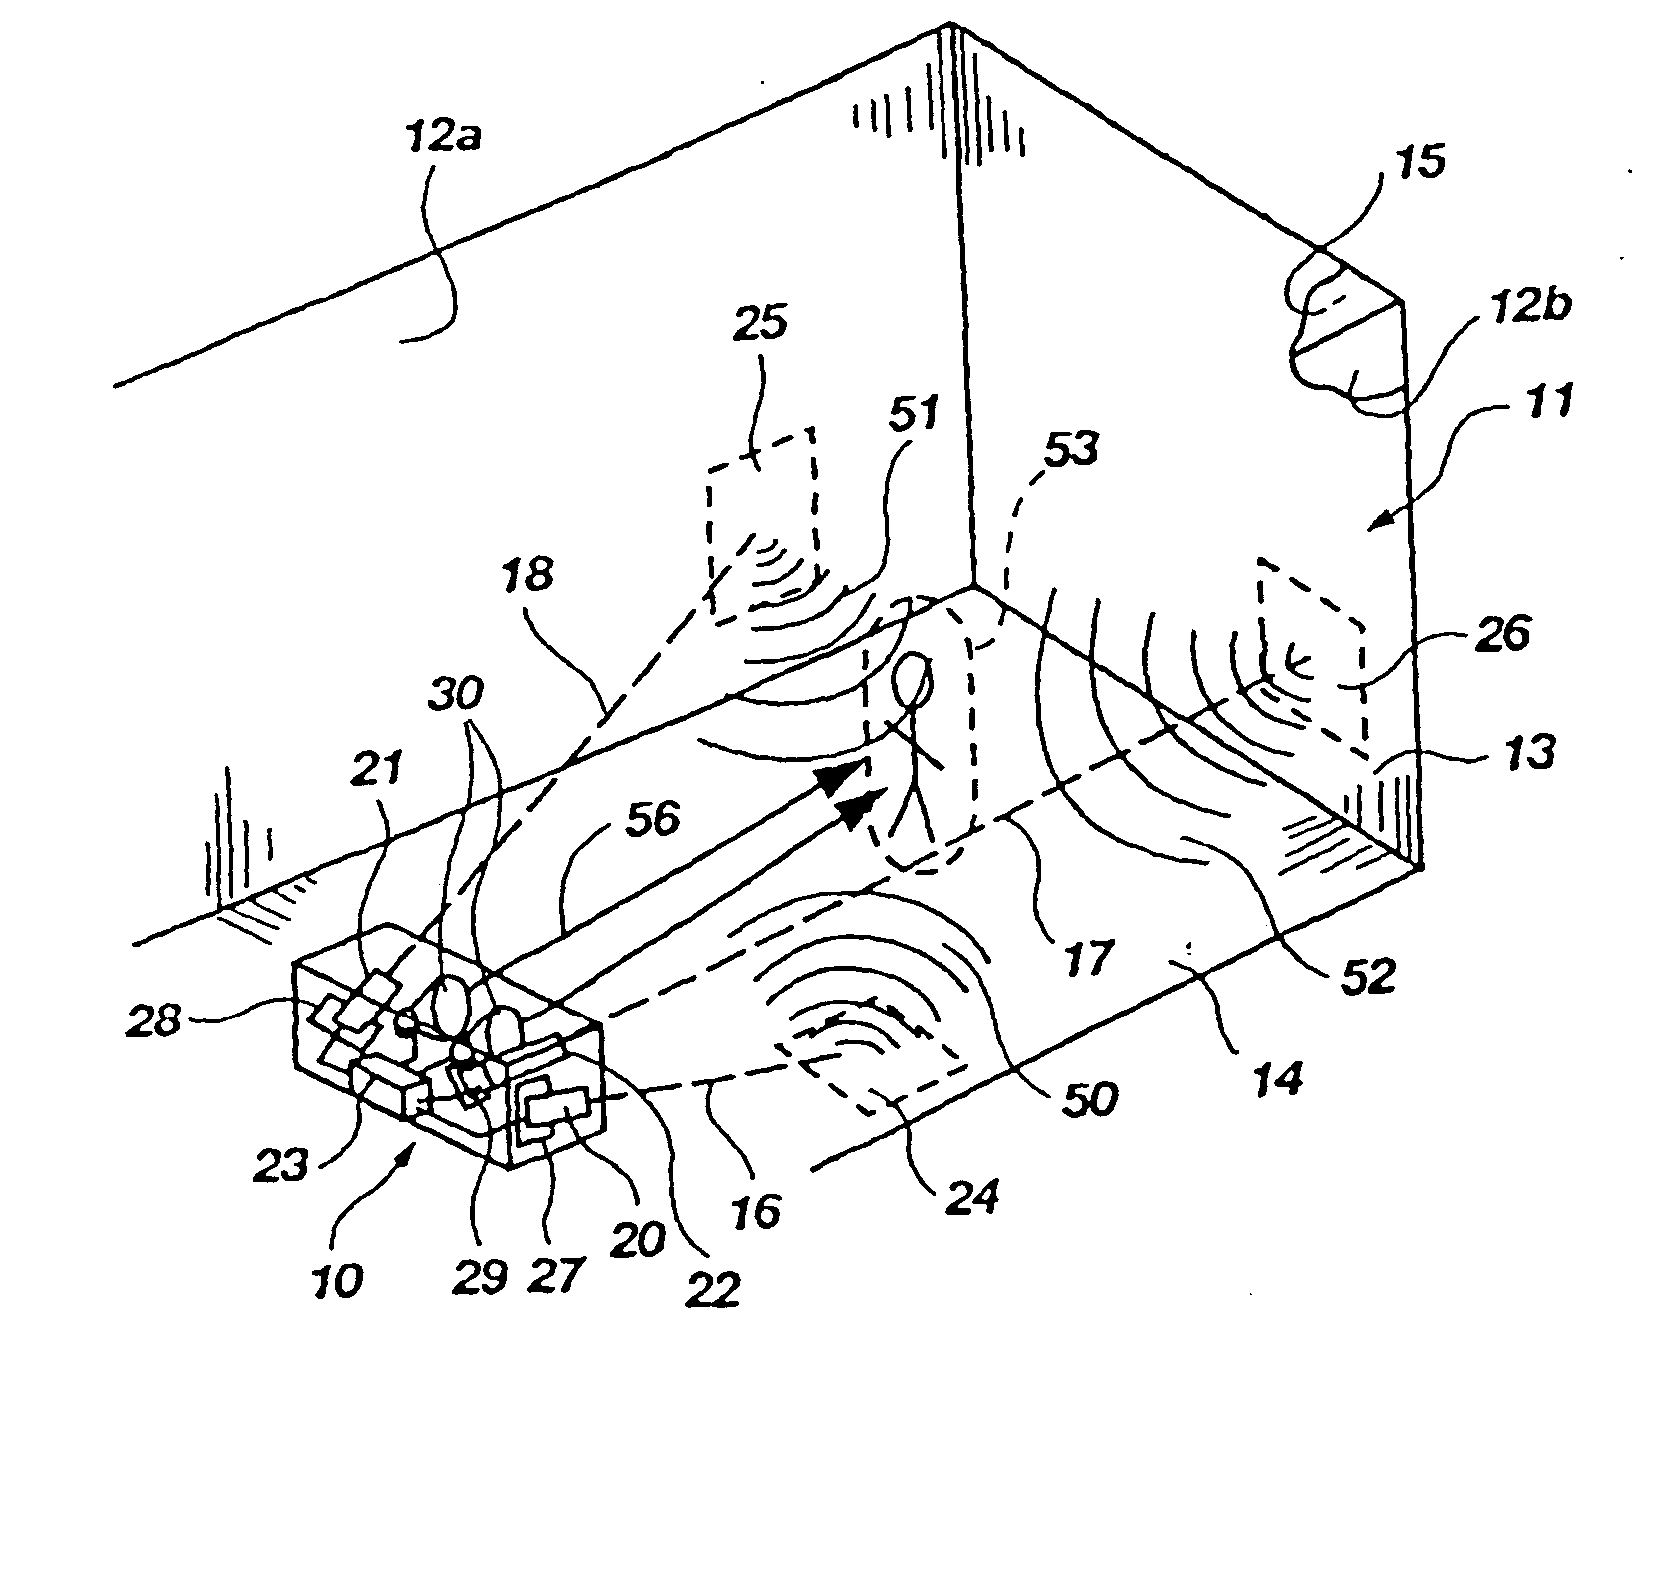 hight resolution of home surround sound wiring home surround sound wiring diagram wiring a surround sound system wiring diagram